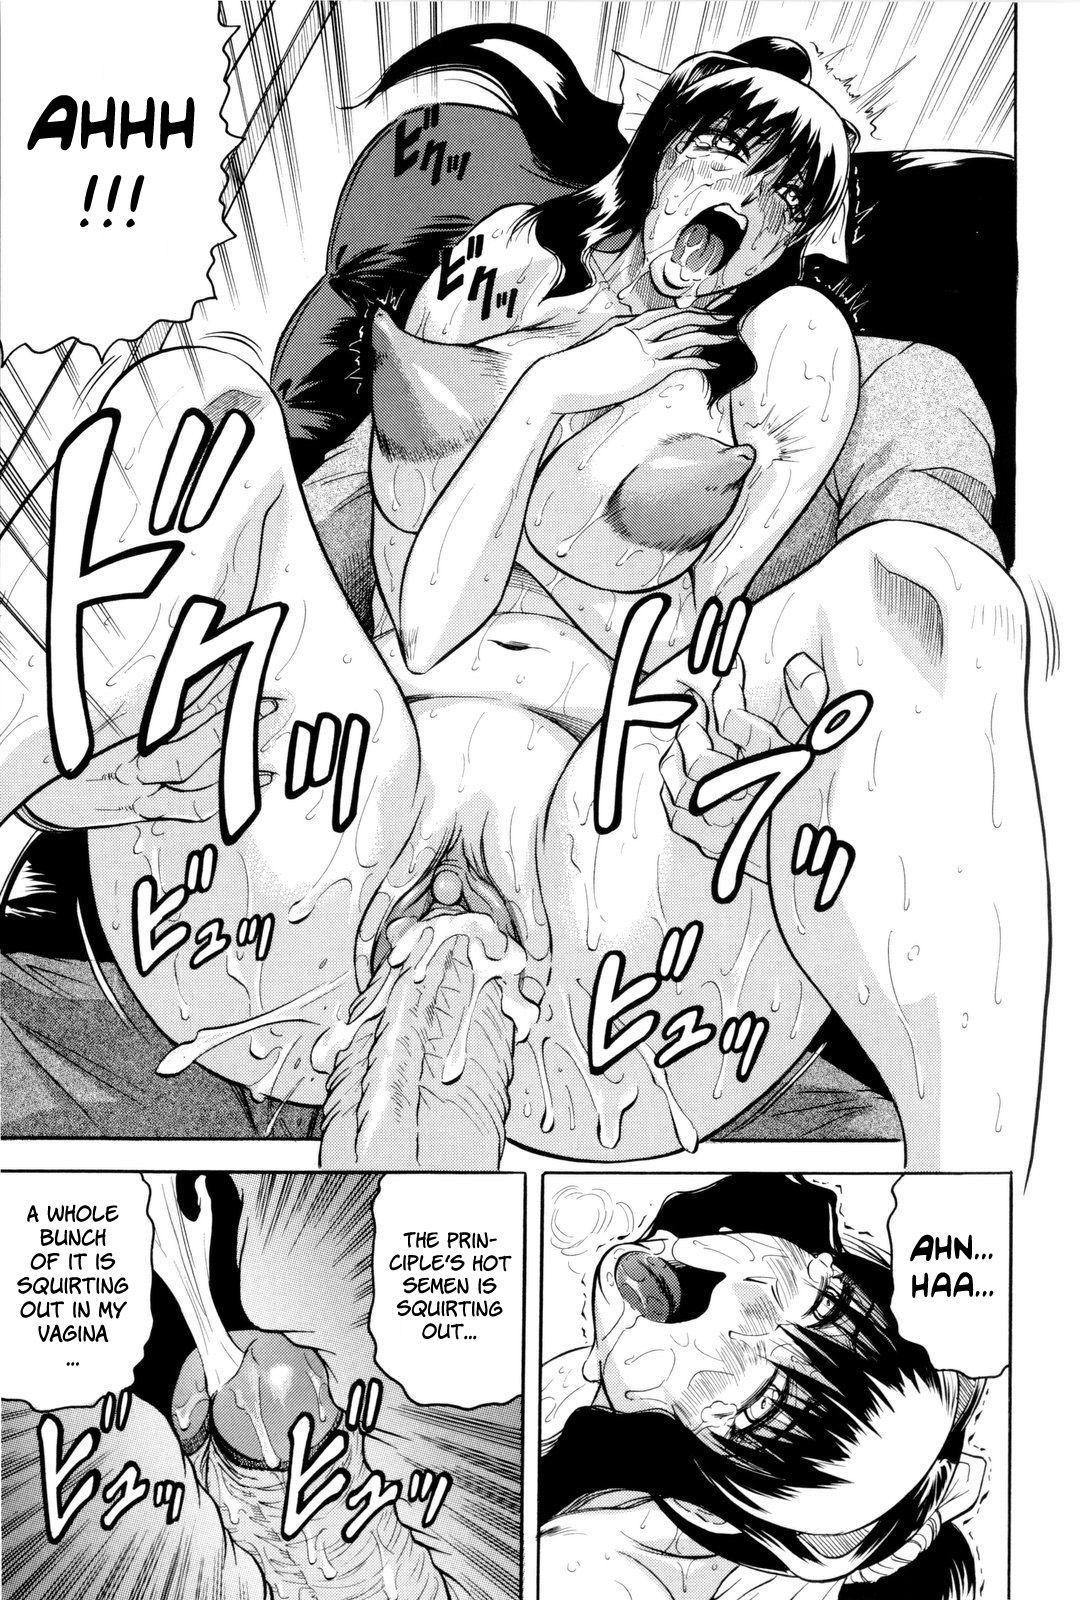 Sensei ni Dashitee! - It ejaculates in the teacher! 144